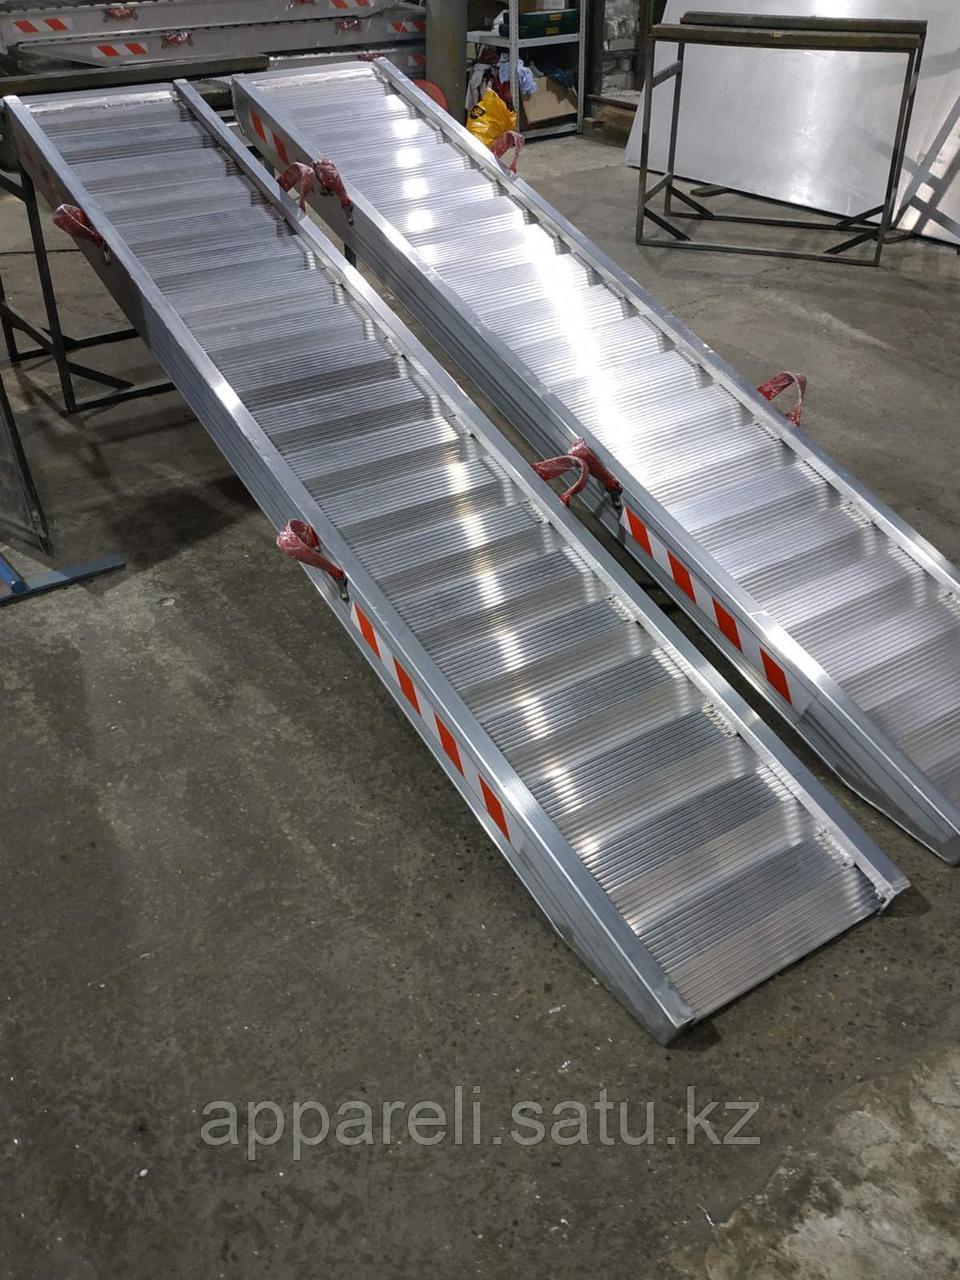 Аппарели от производителя для спецтехники 10 тонн с бортами